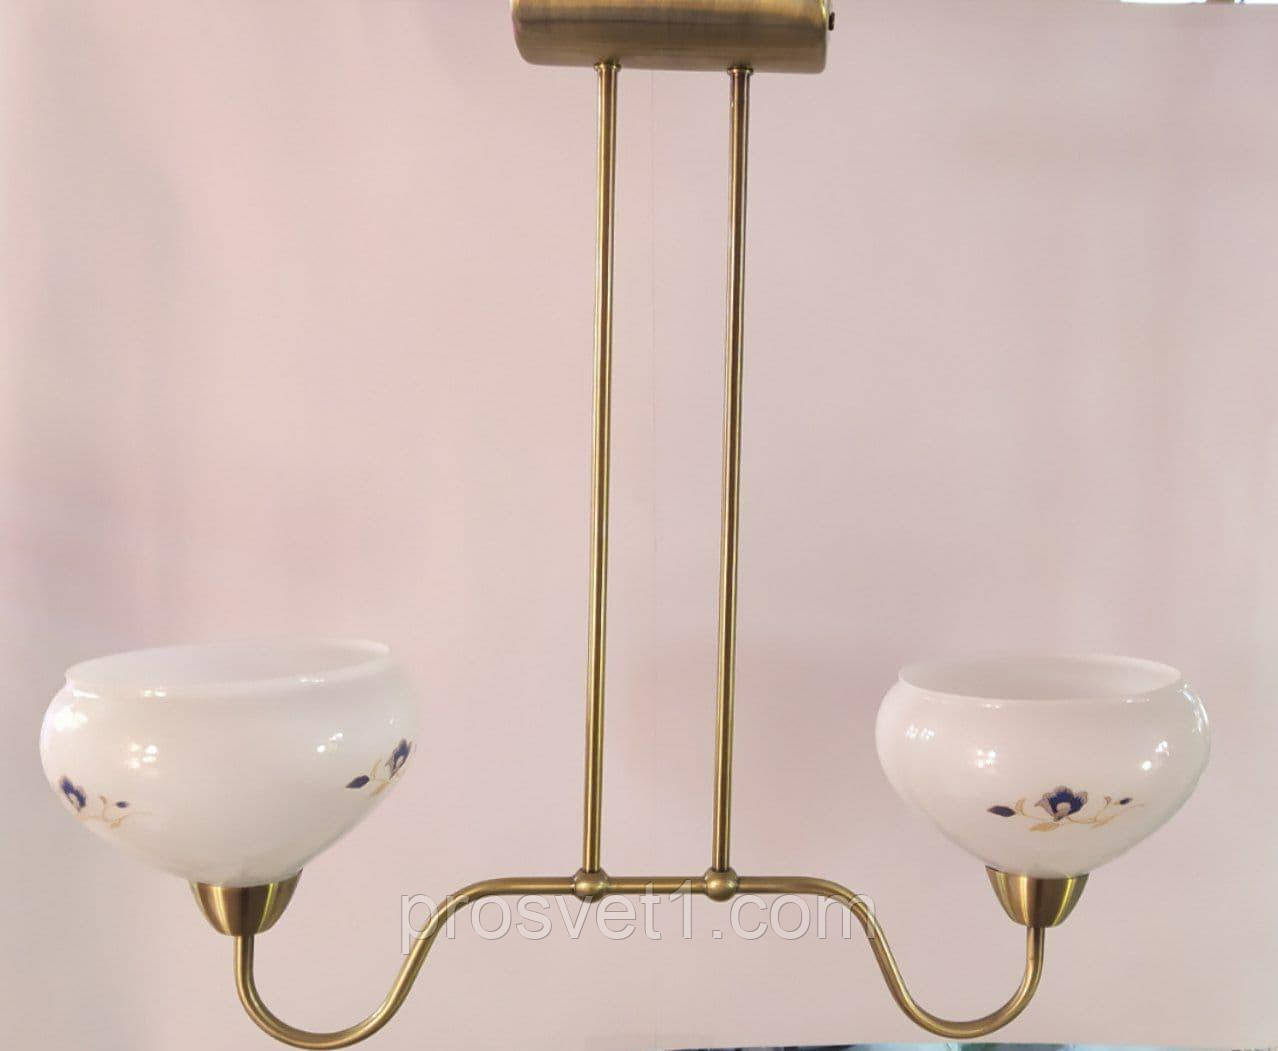 Люстра EG15000-2 антична бронза Melody